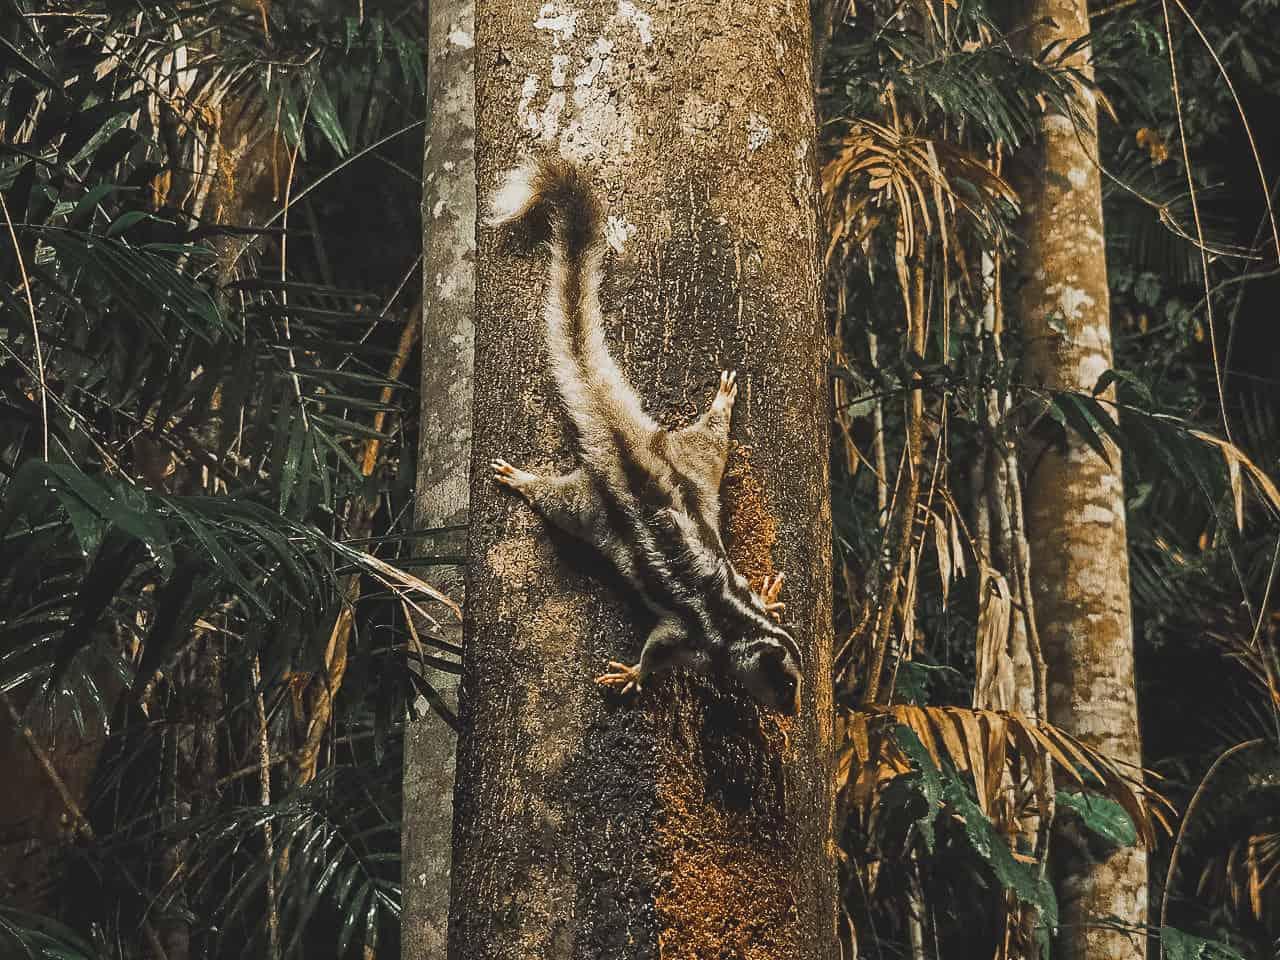 striped-possum-Chambers-Wildlife-Lodge-Atherton-Tablelands-North-Queensland-Australia ] Travel Mermaid 012